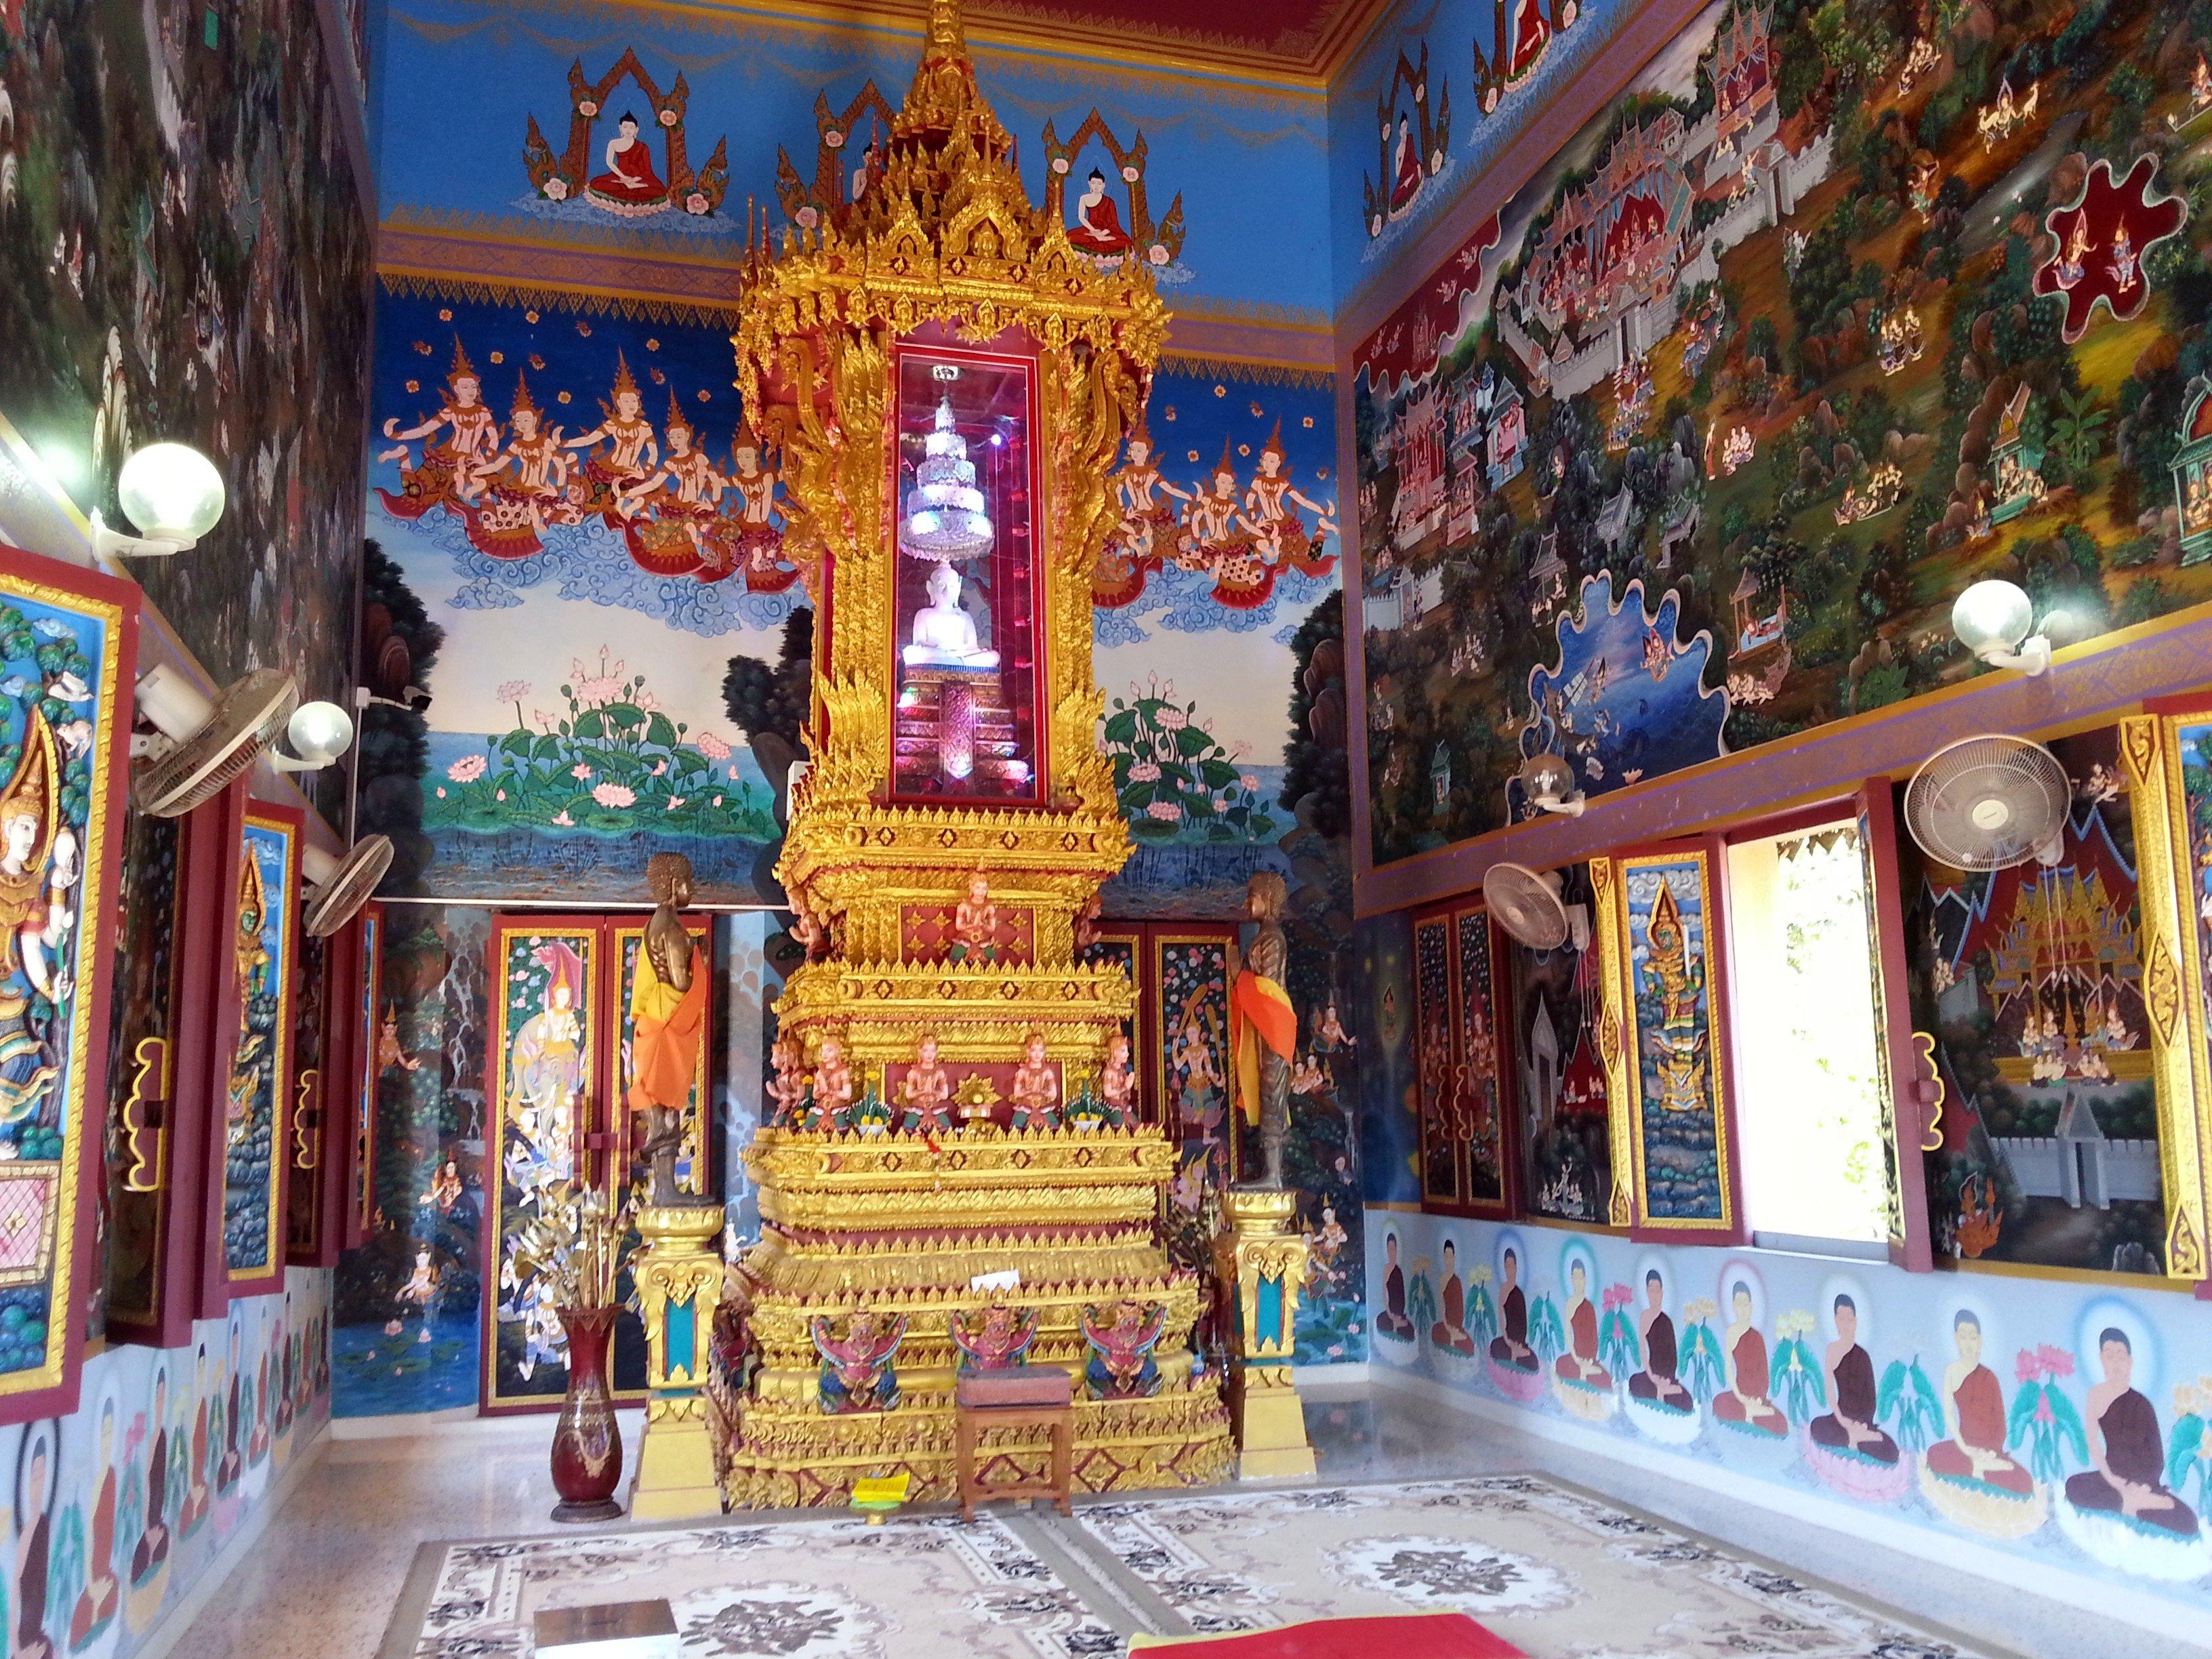 Inside the shrine hall at Wat Khao Rang